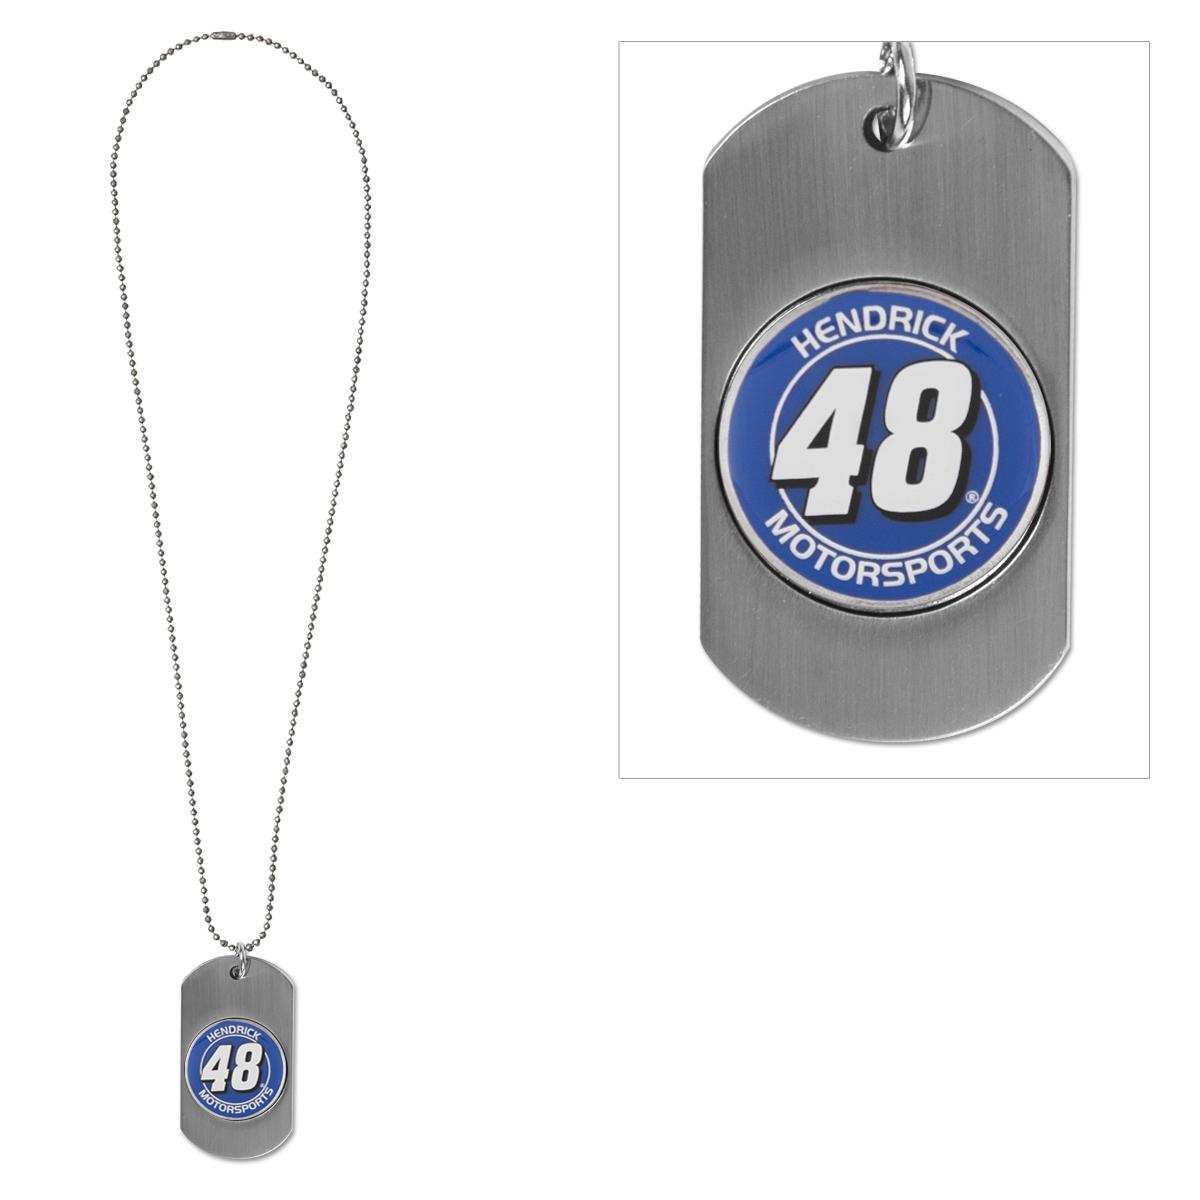 Hendrick MotorSports #48 Dog Tag